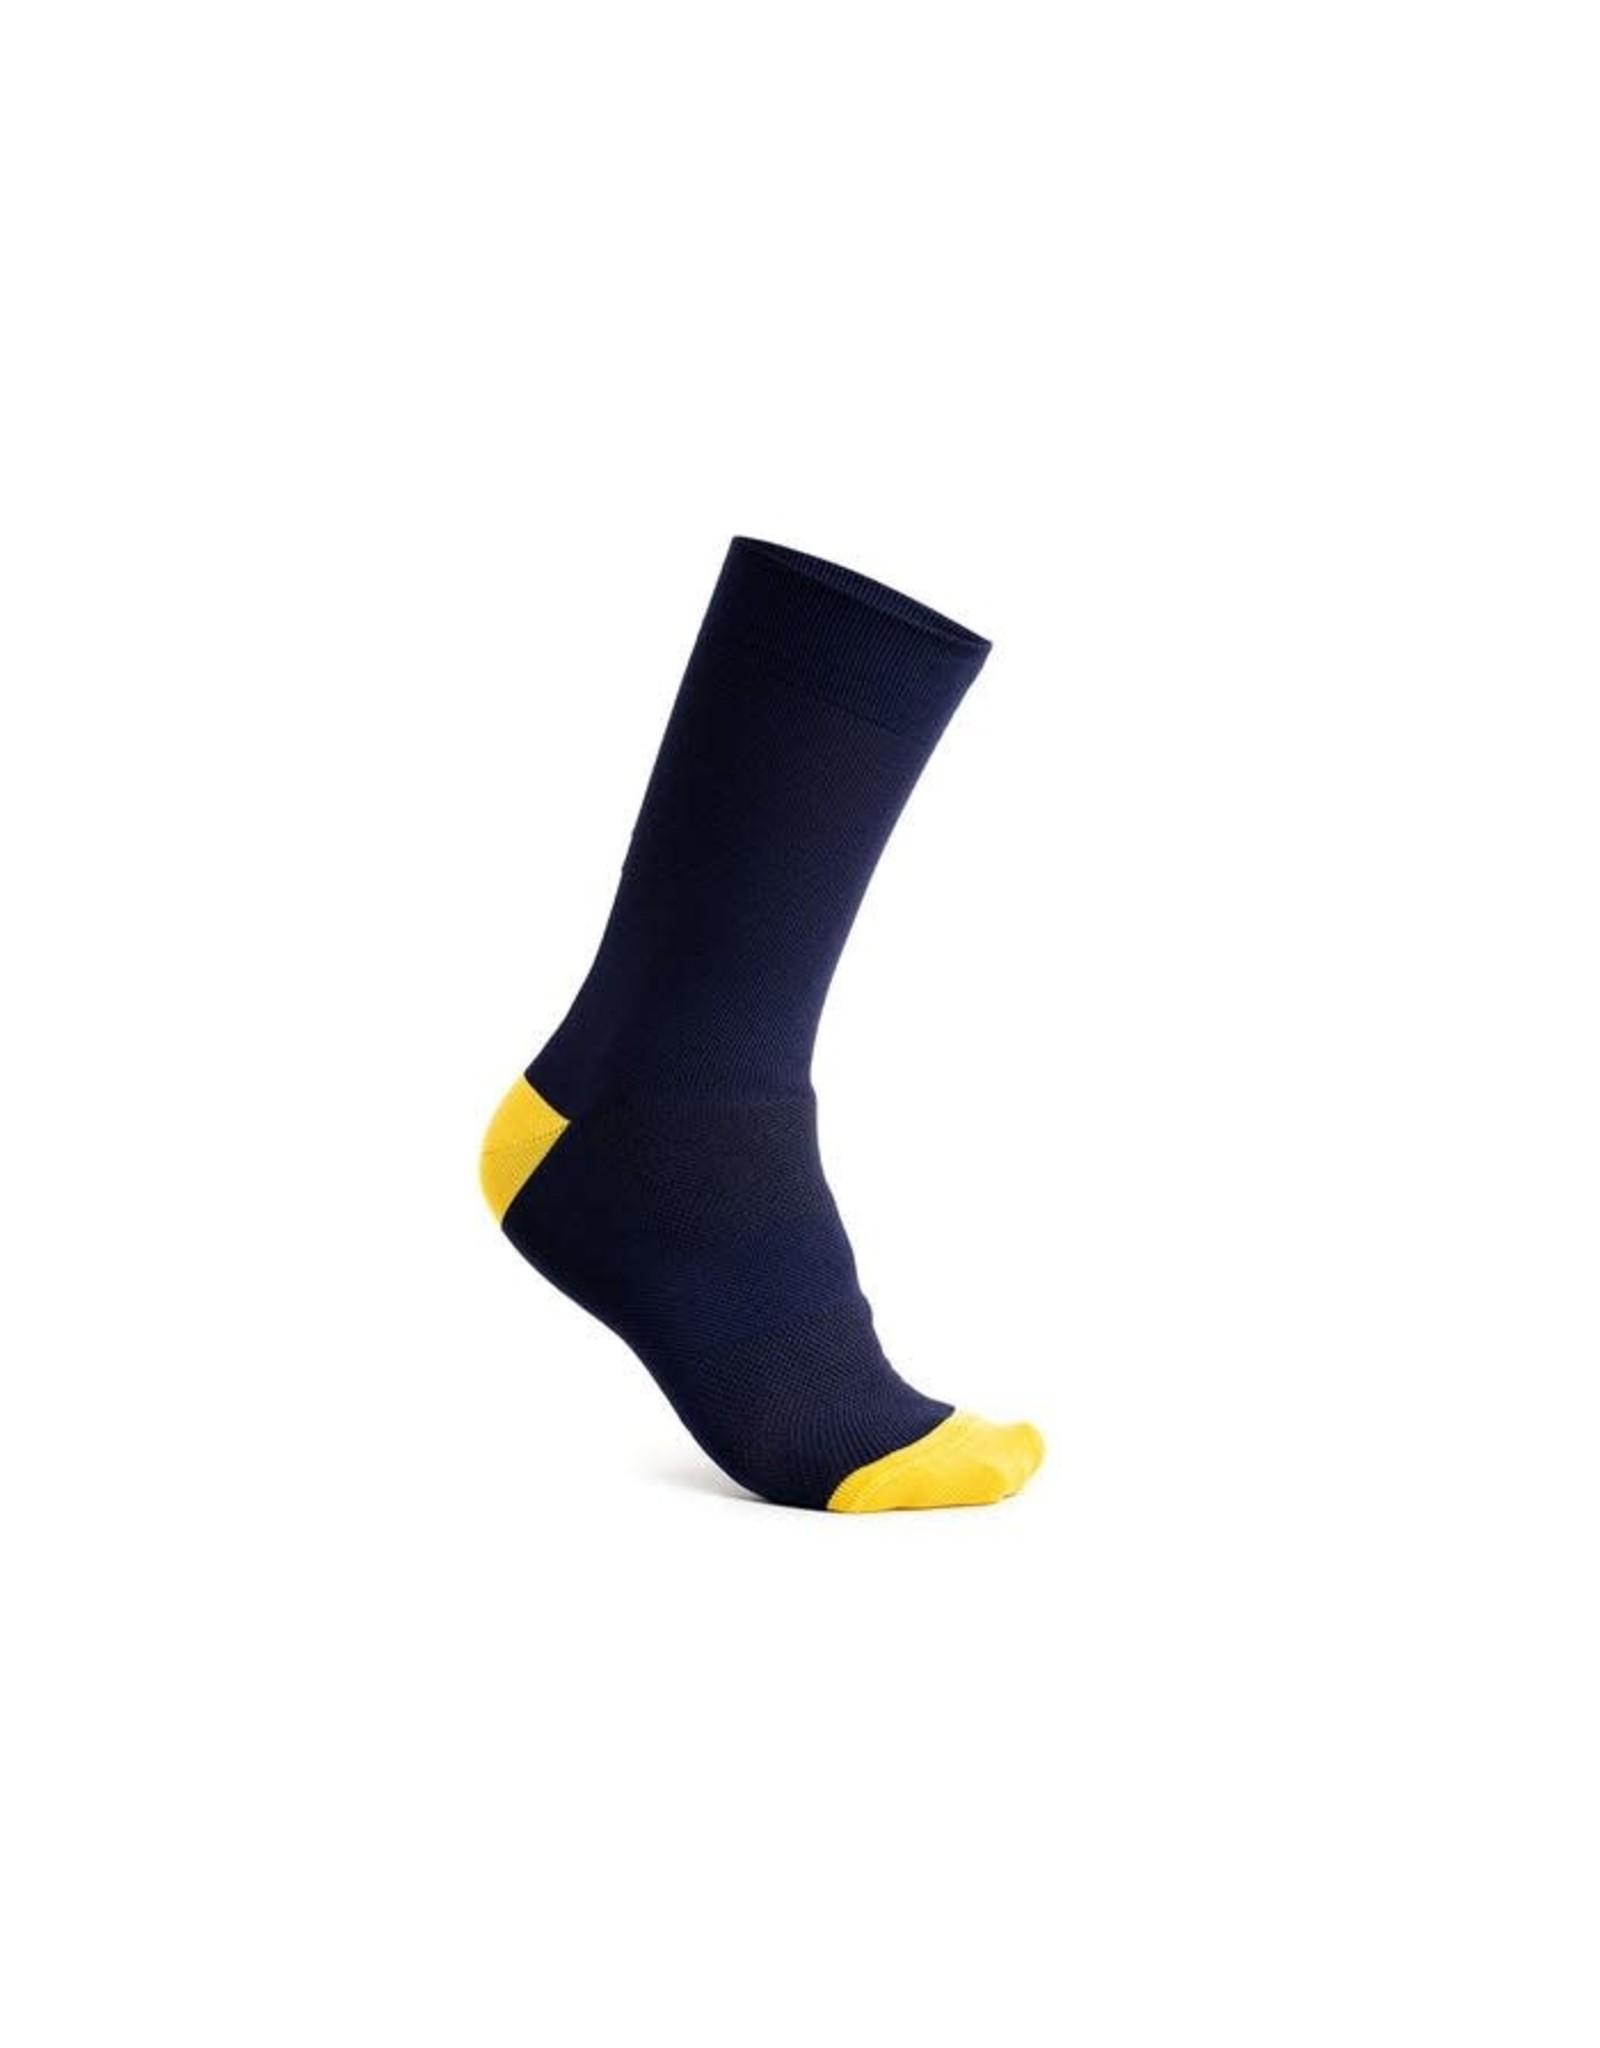 7MESH 7MESH - Word Sock Eclipse Lrg